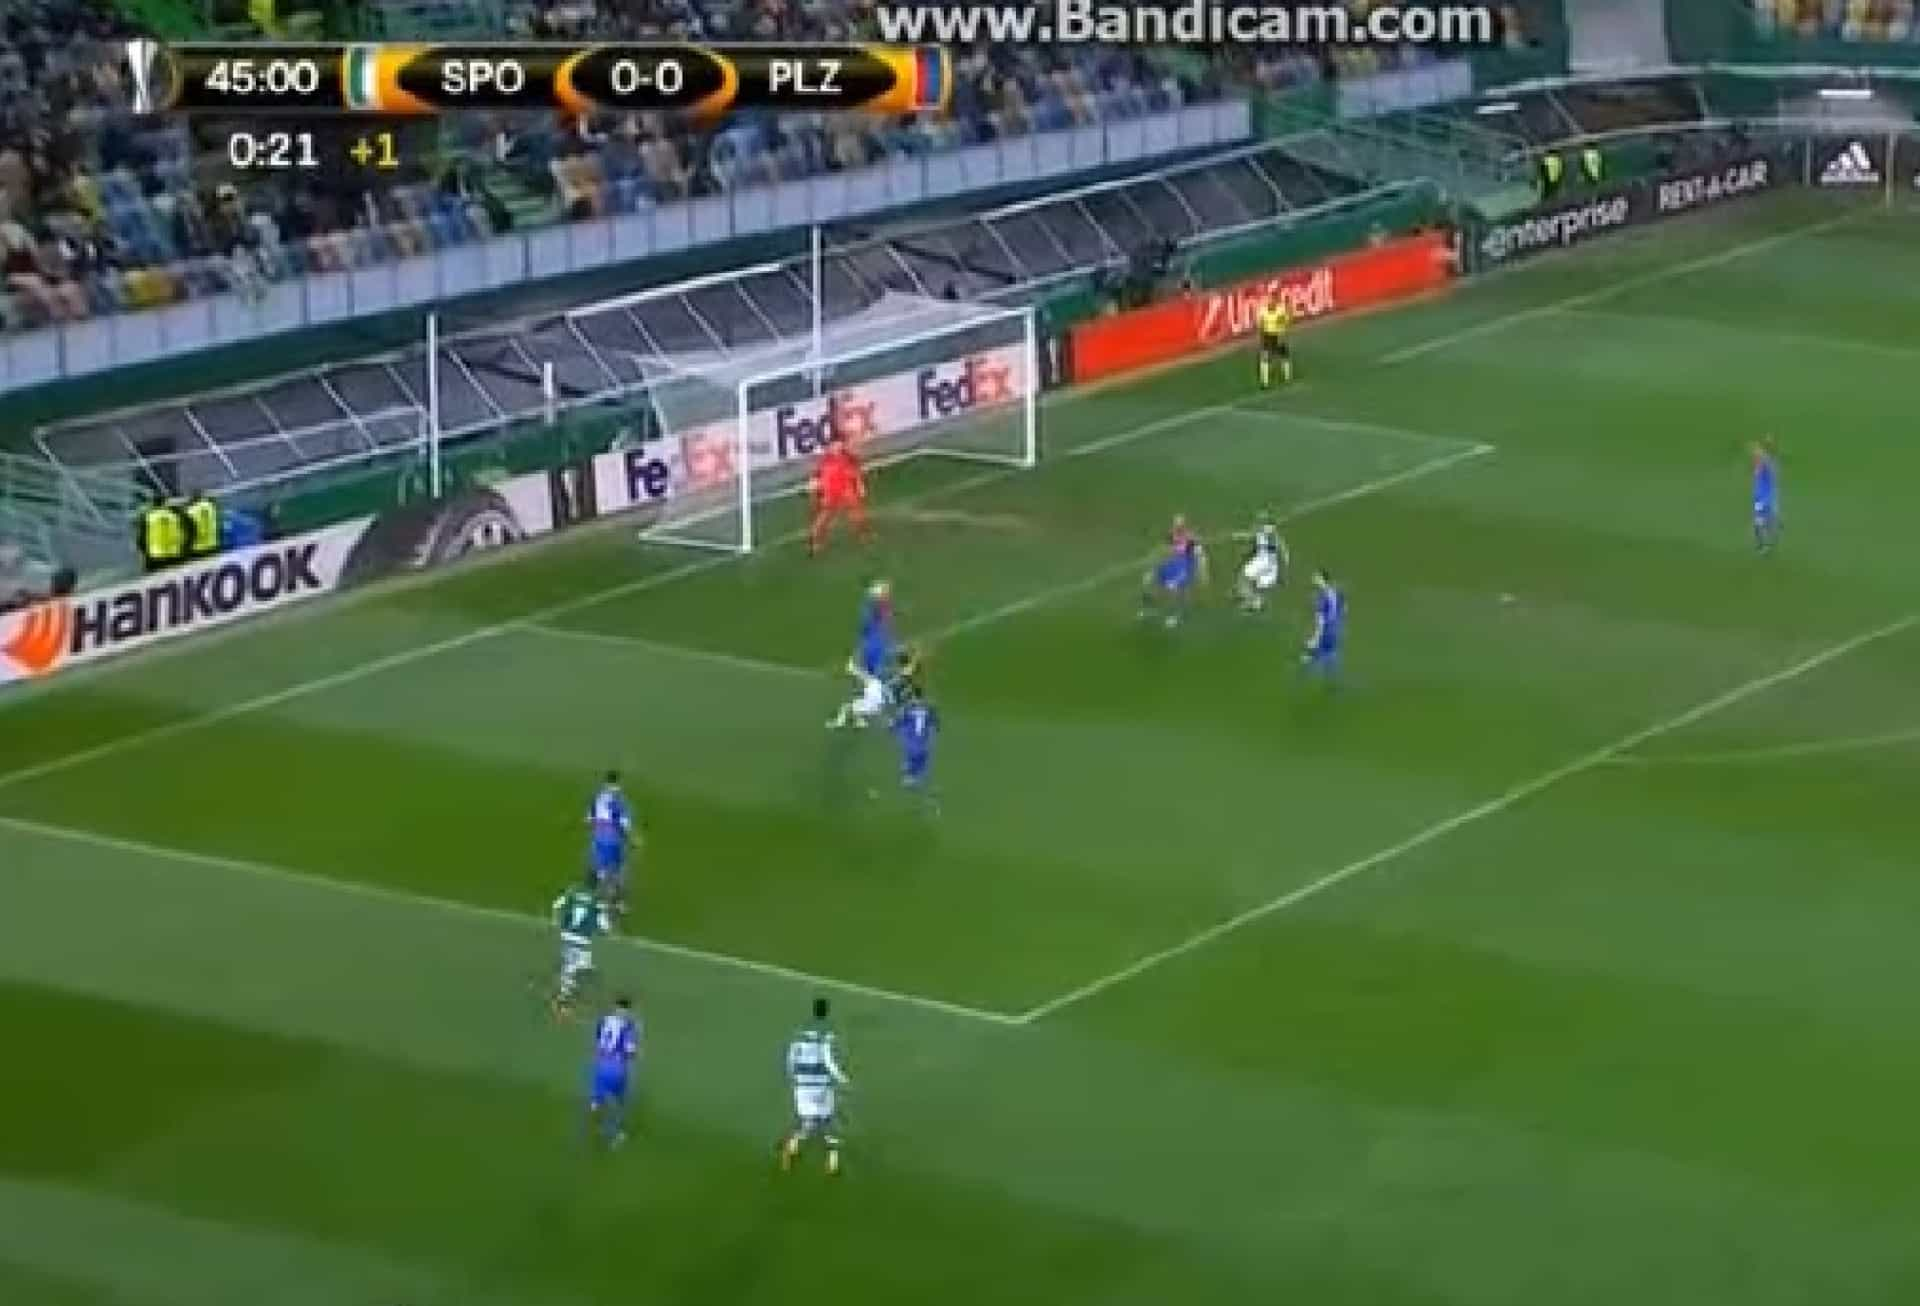 Incrível: Jogada fantástica de Coentrão no golo de Montero ao Plzen